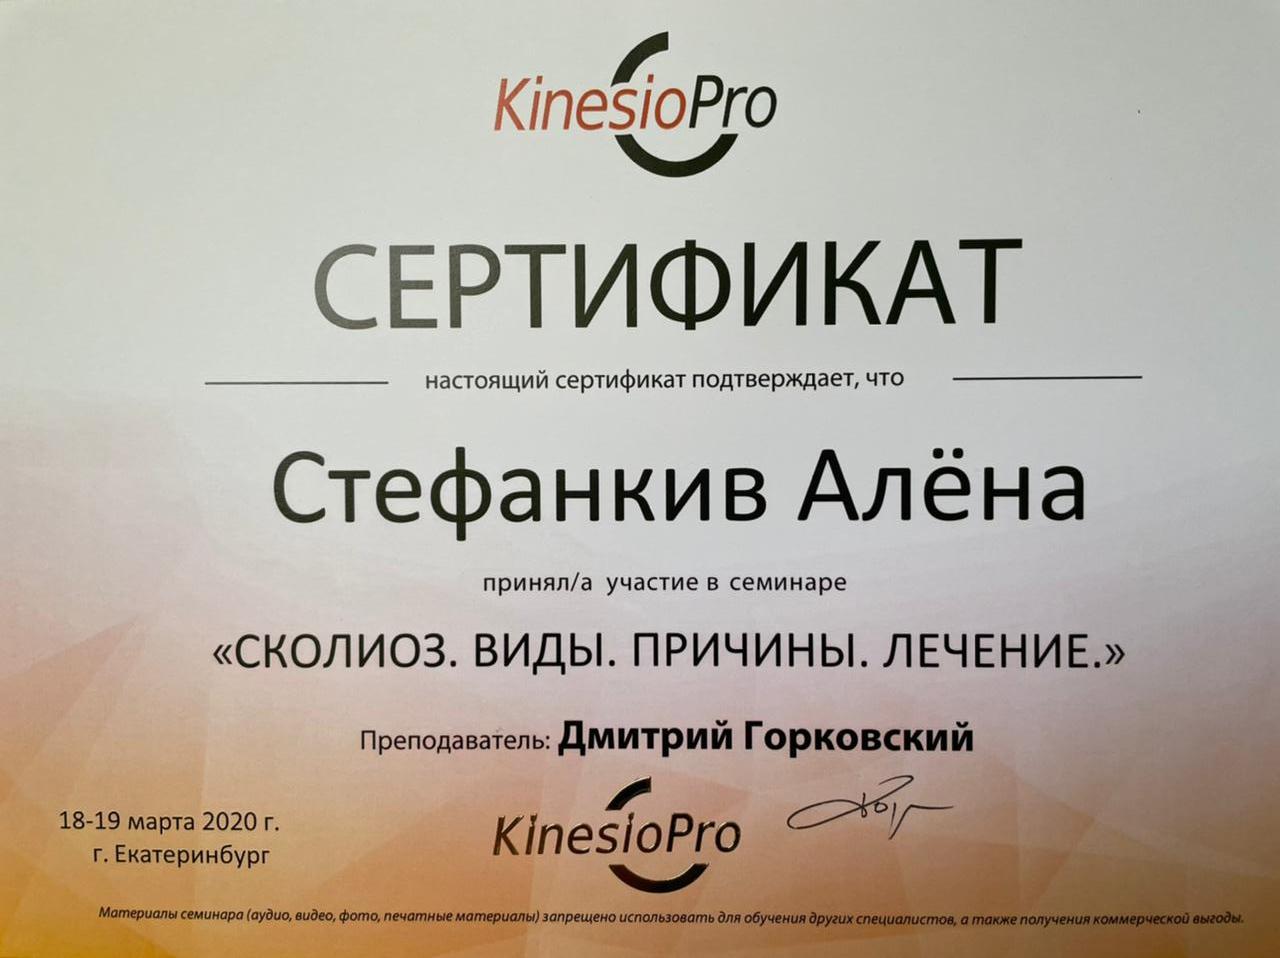 IMG_20210818_164055